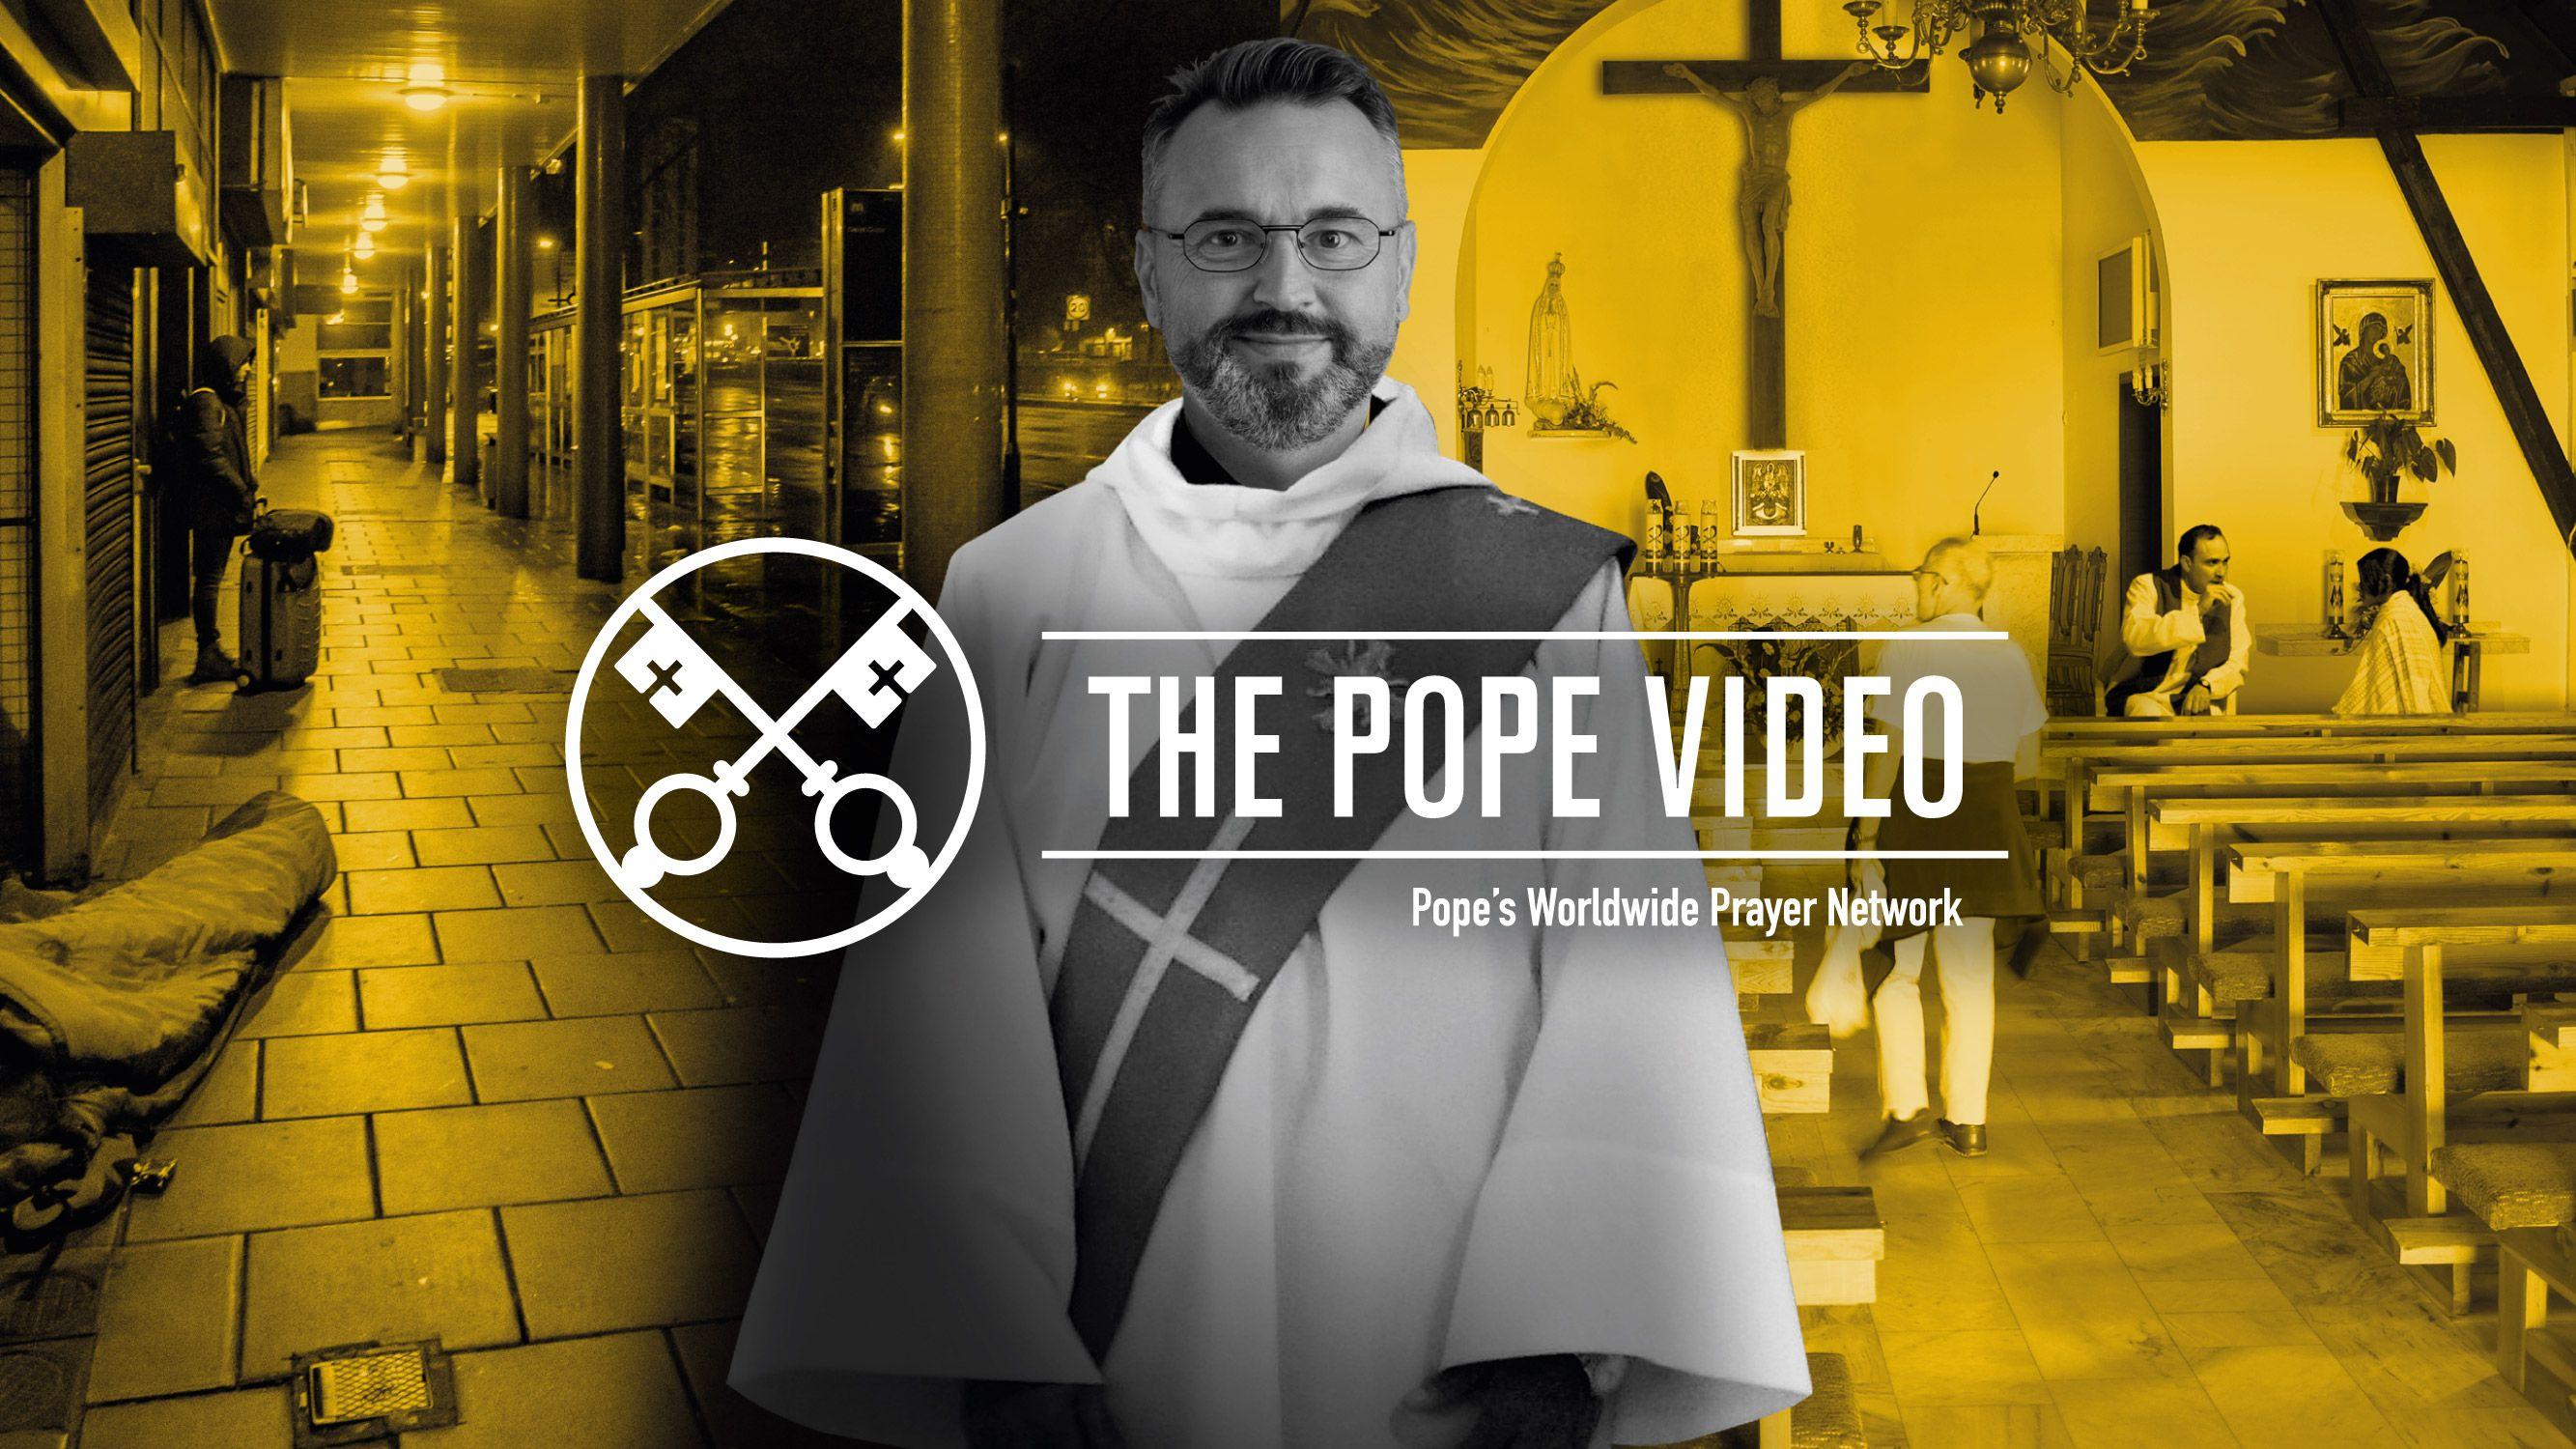 Official-Image-TPV-5-2020-EN-The-Pope-Video-For-deacons